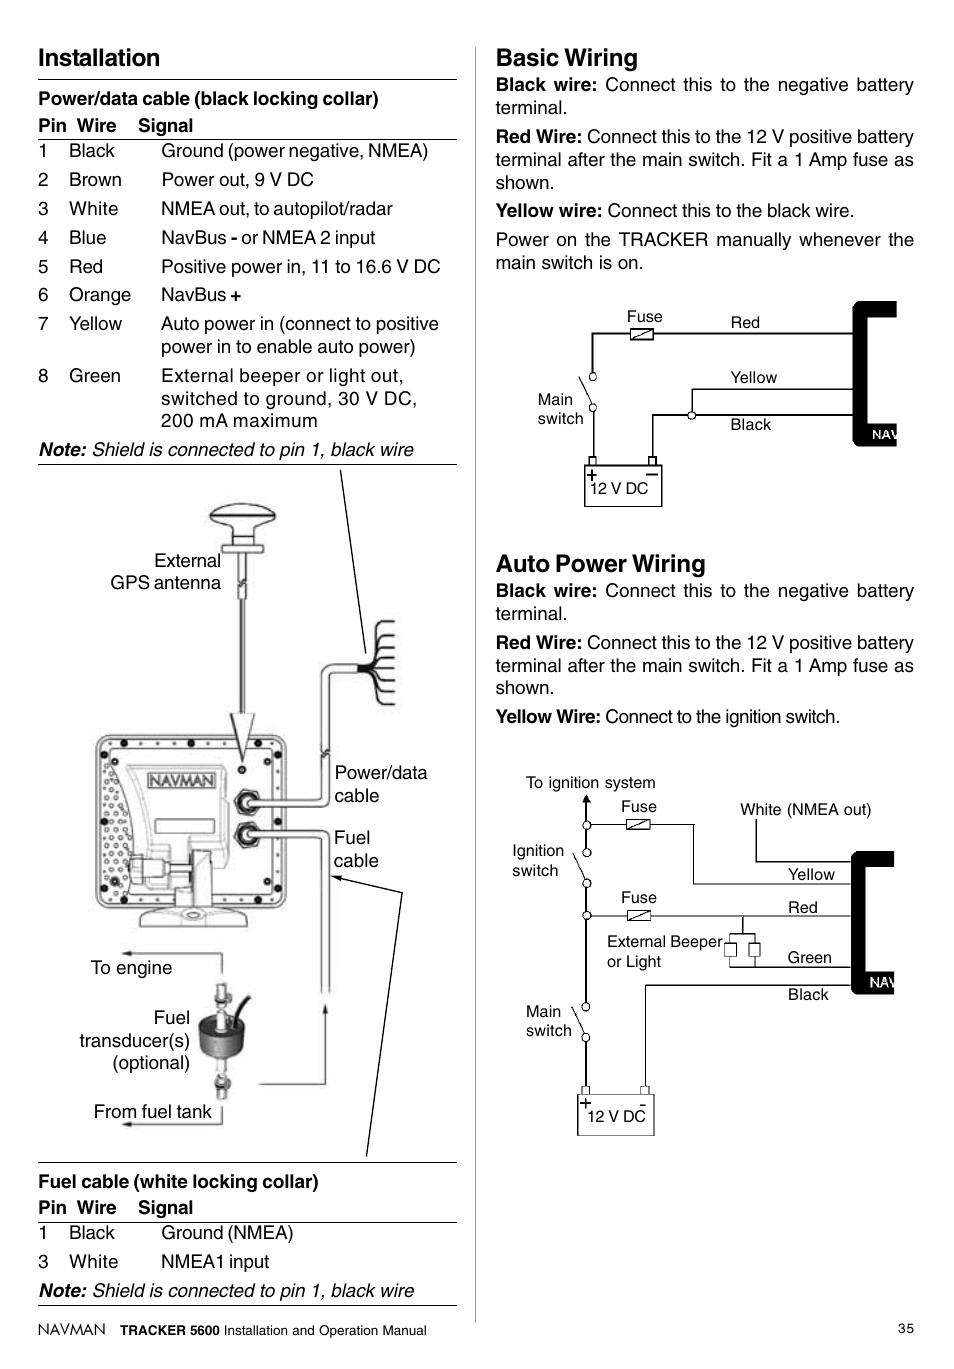 hight resolution of installation auto power wiring basic wiring navman tracker plotter tracker 5600 user manual page 35 42